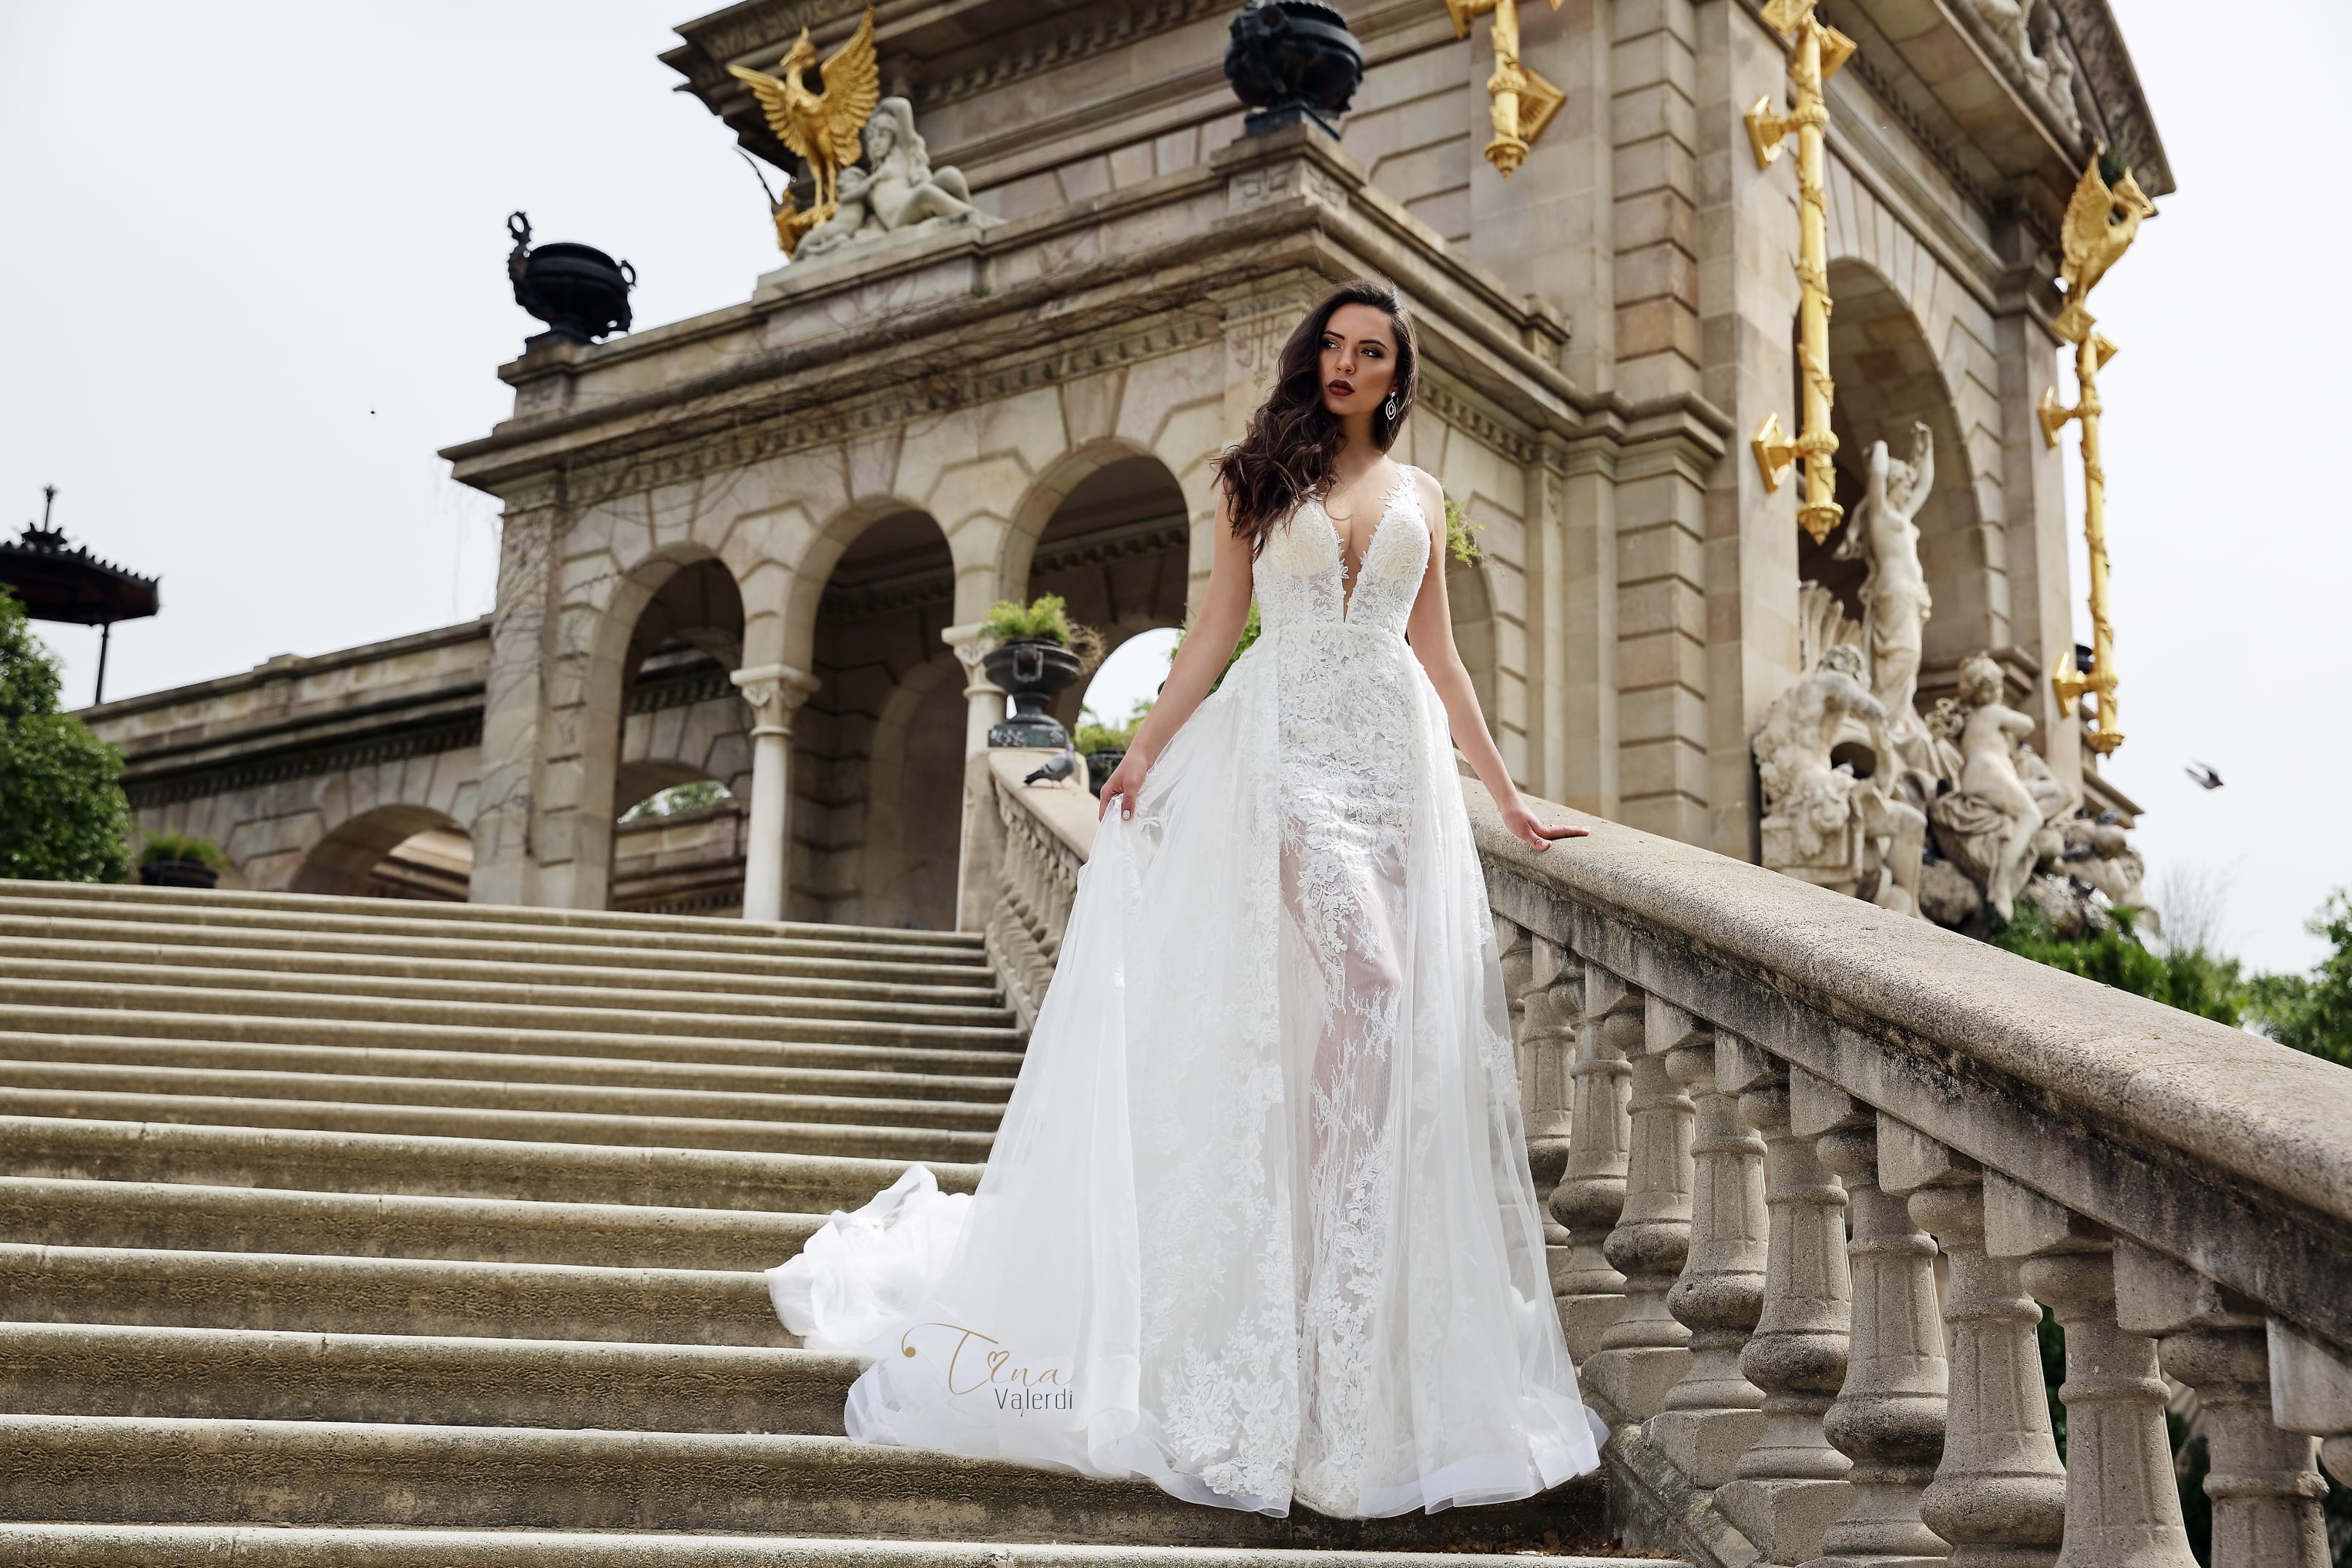 vestuvines sukneles tina valerdi Mariana4